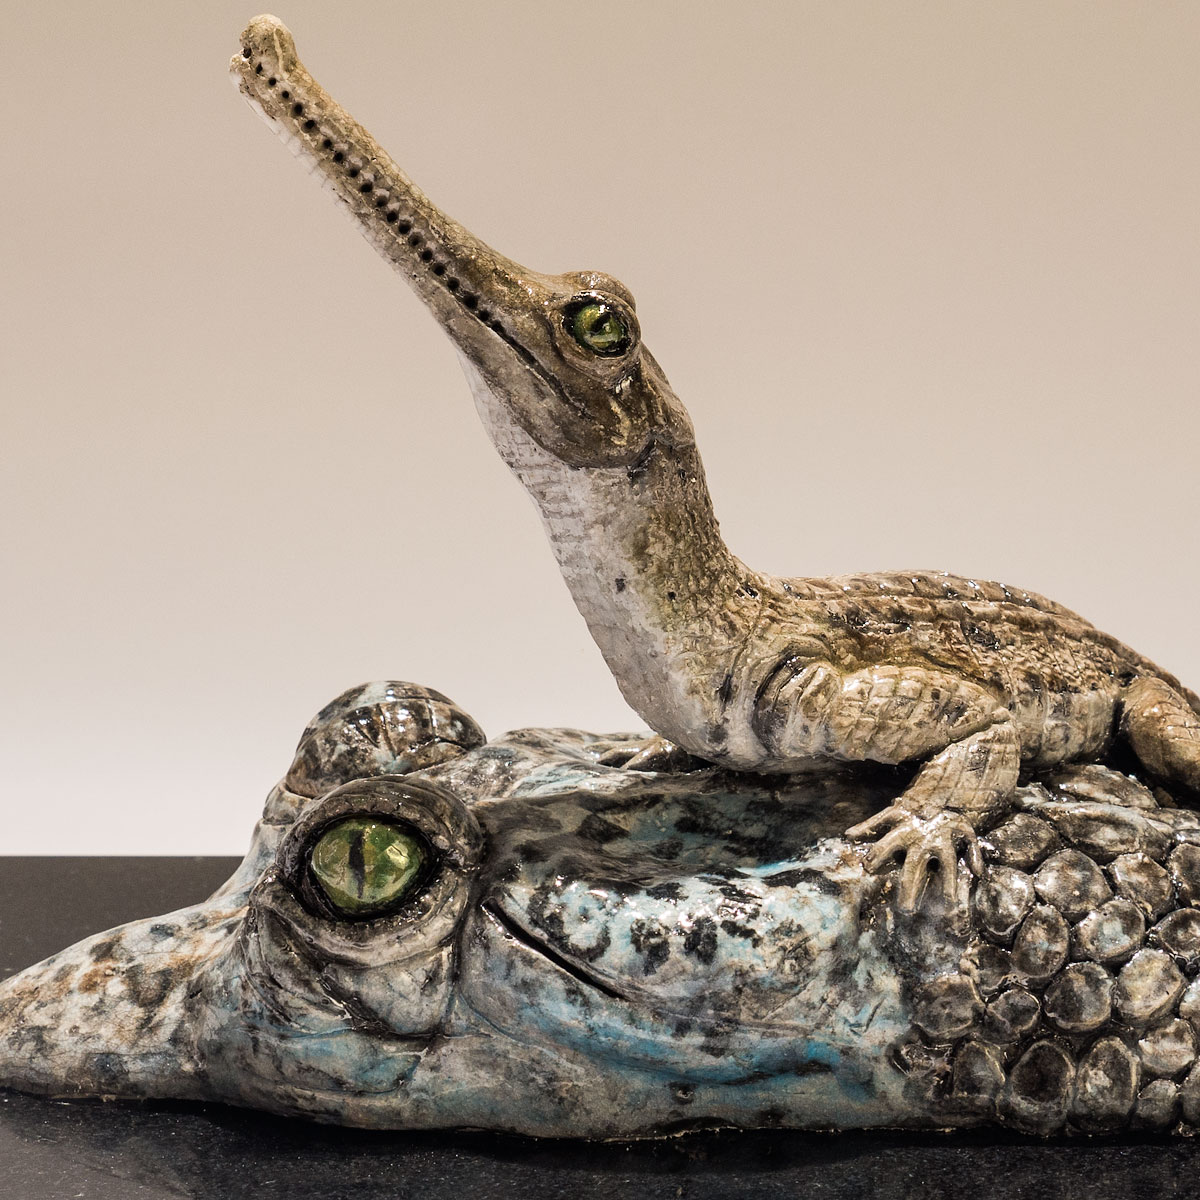 BBC Wildlife Photographer of the Year